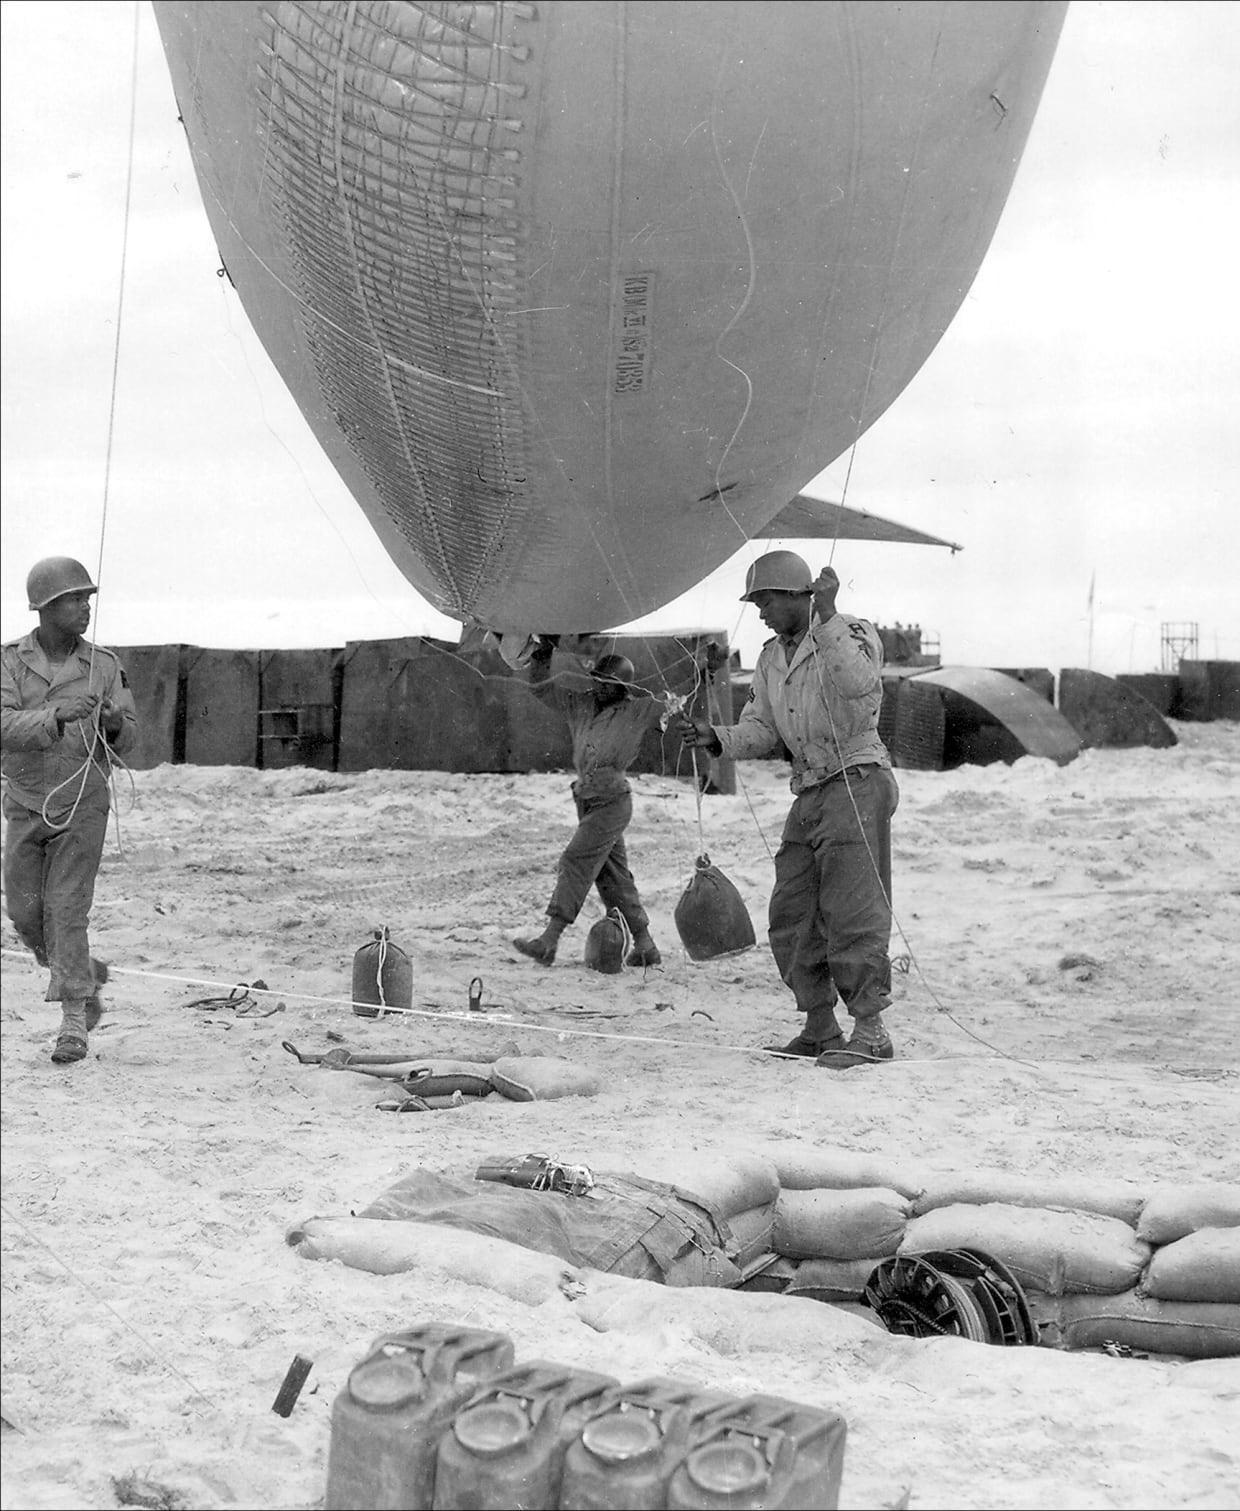 The 320th Barrage Balloon Battalion